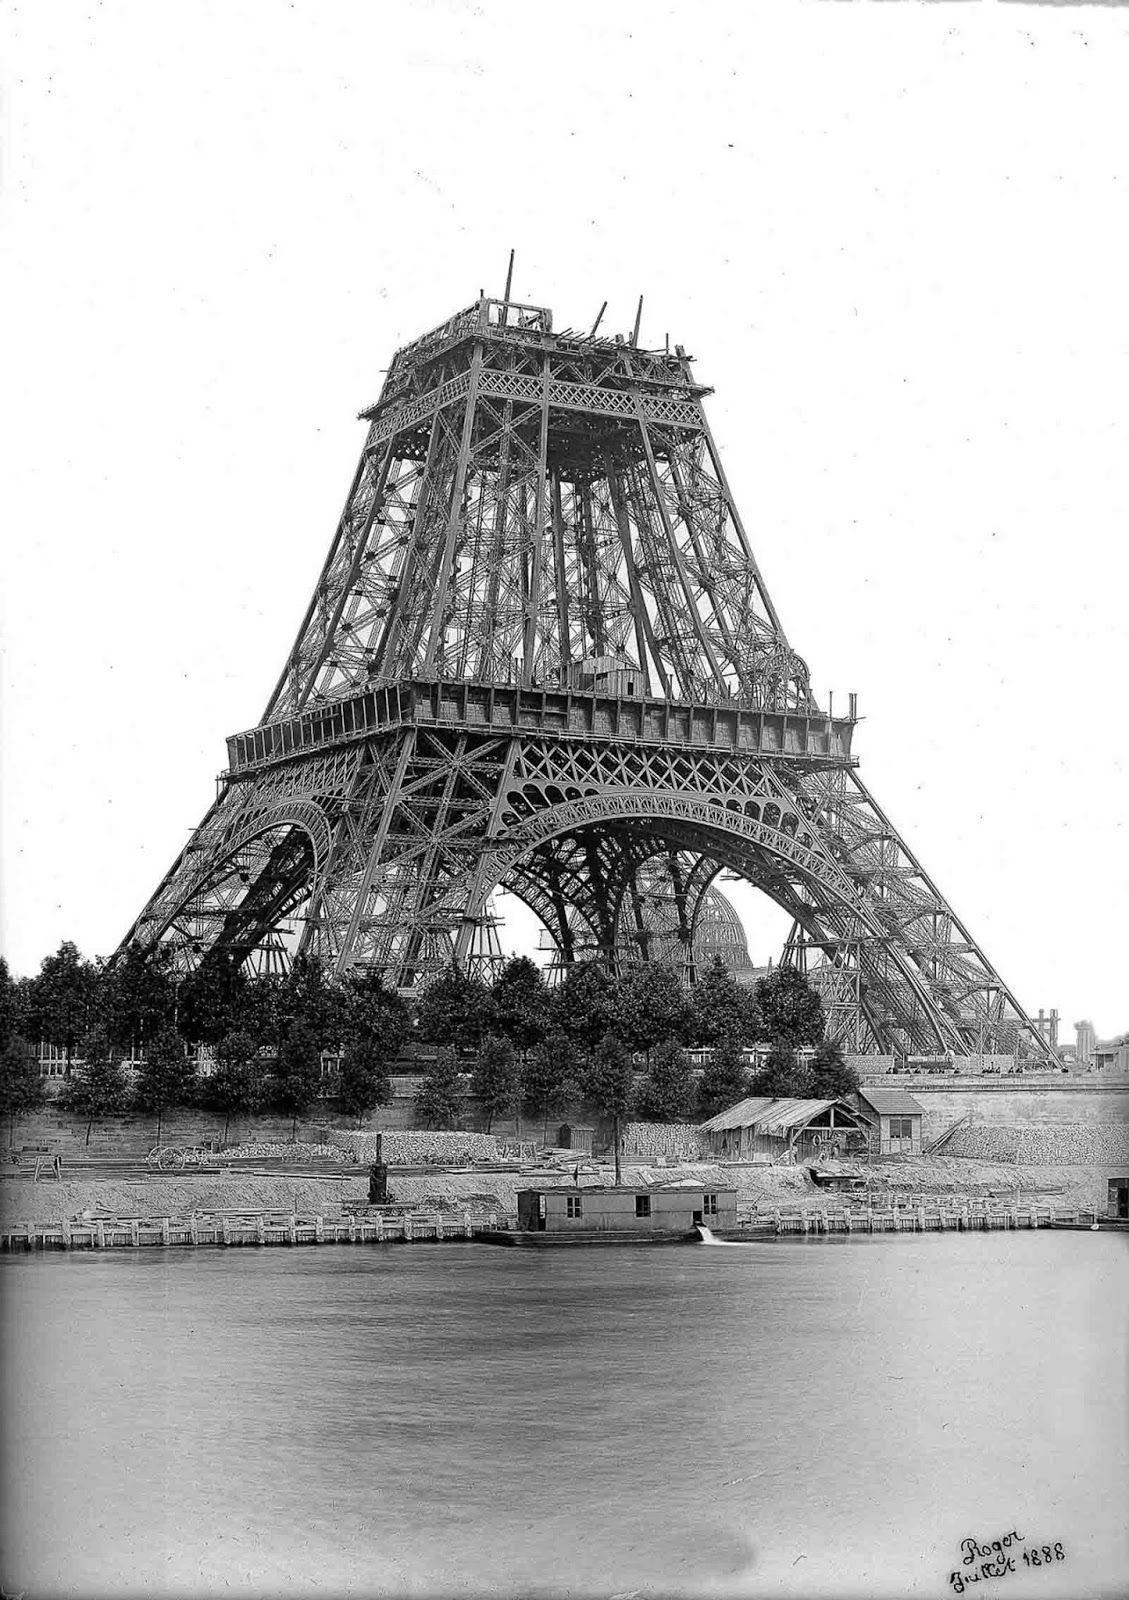 The Eiffel Tower under construction